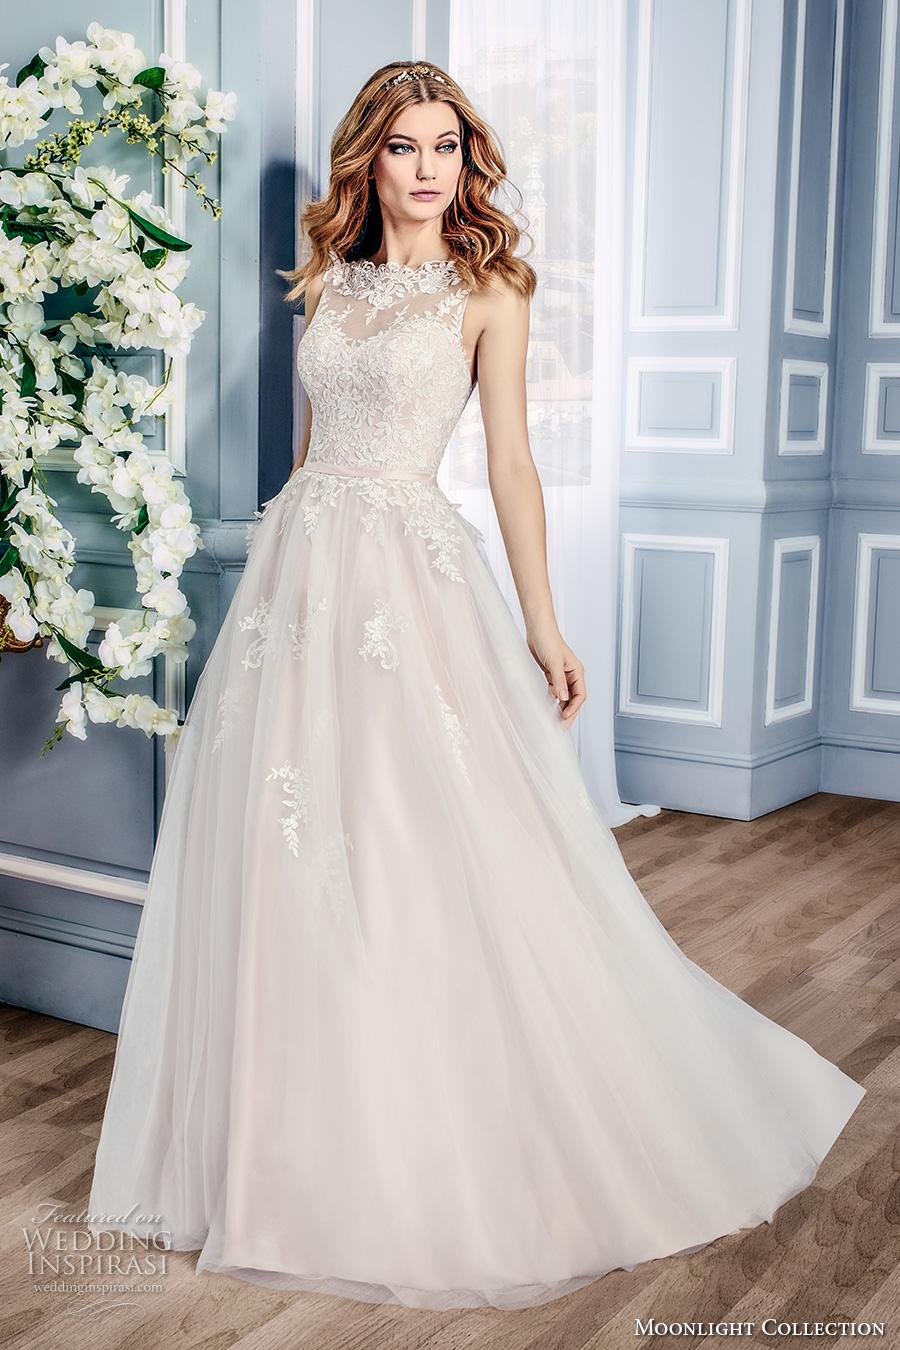 Moonlight collection fall 2016 wedding dresses wedding for Illusion sweetheart neckline wedding dress